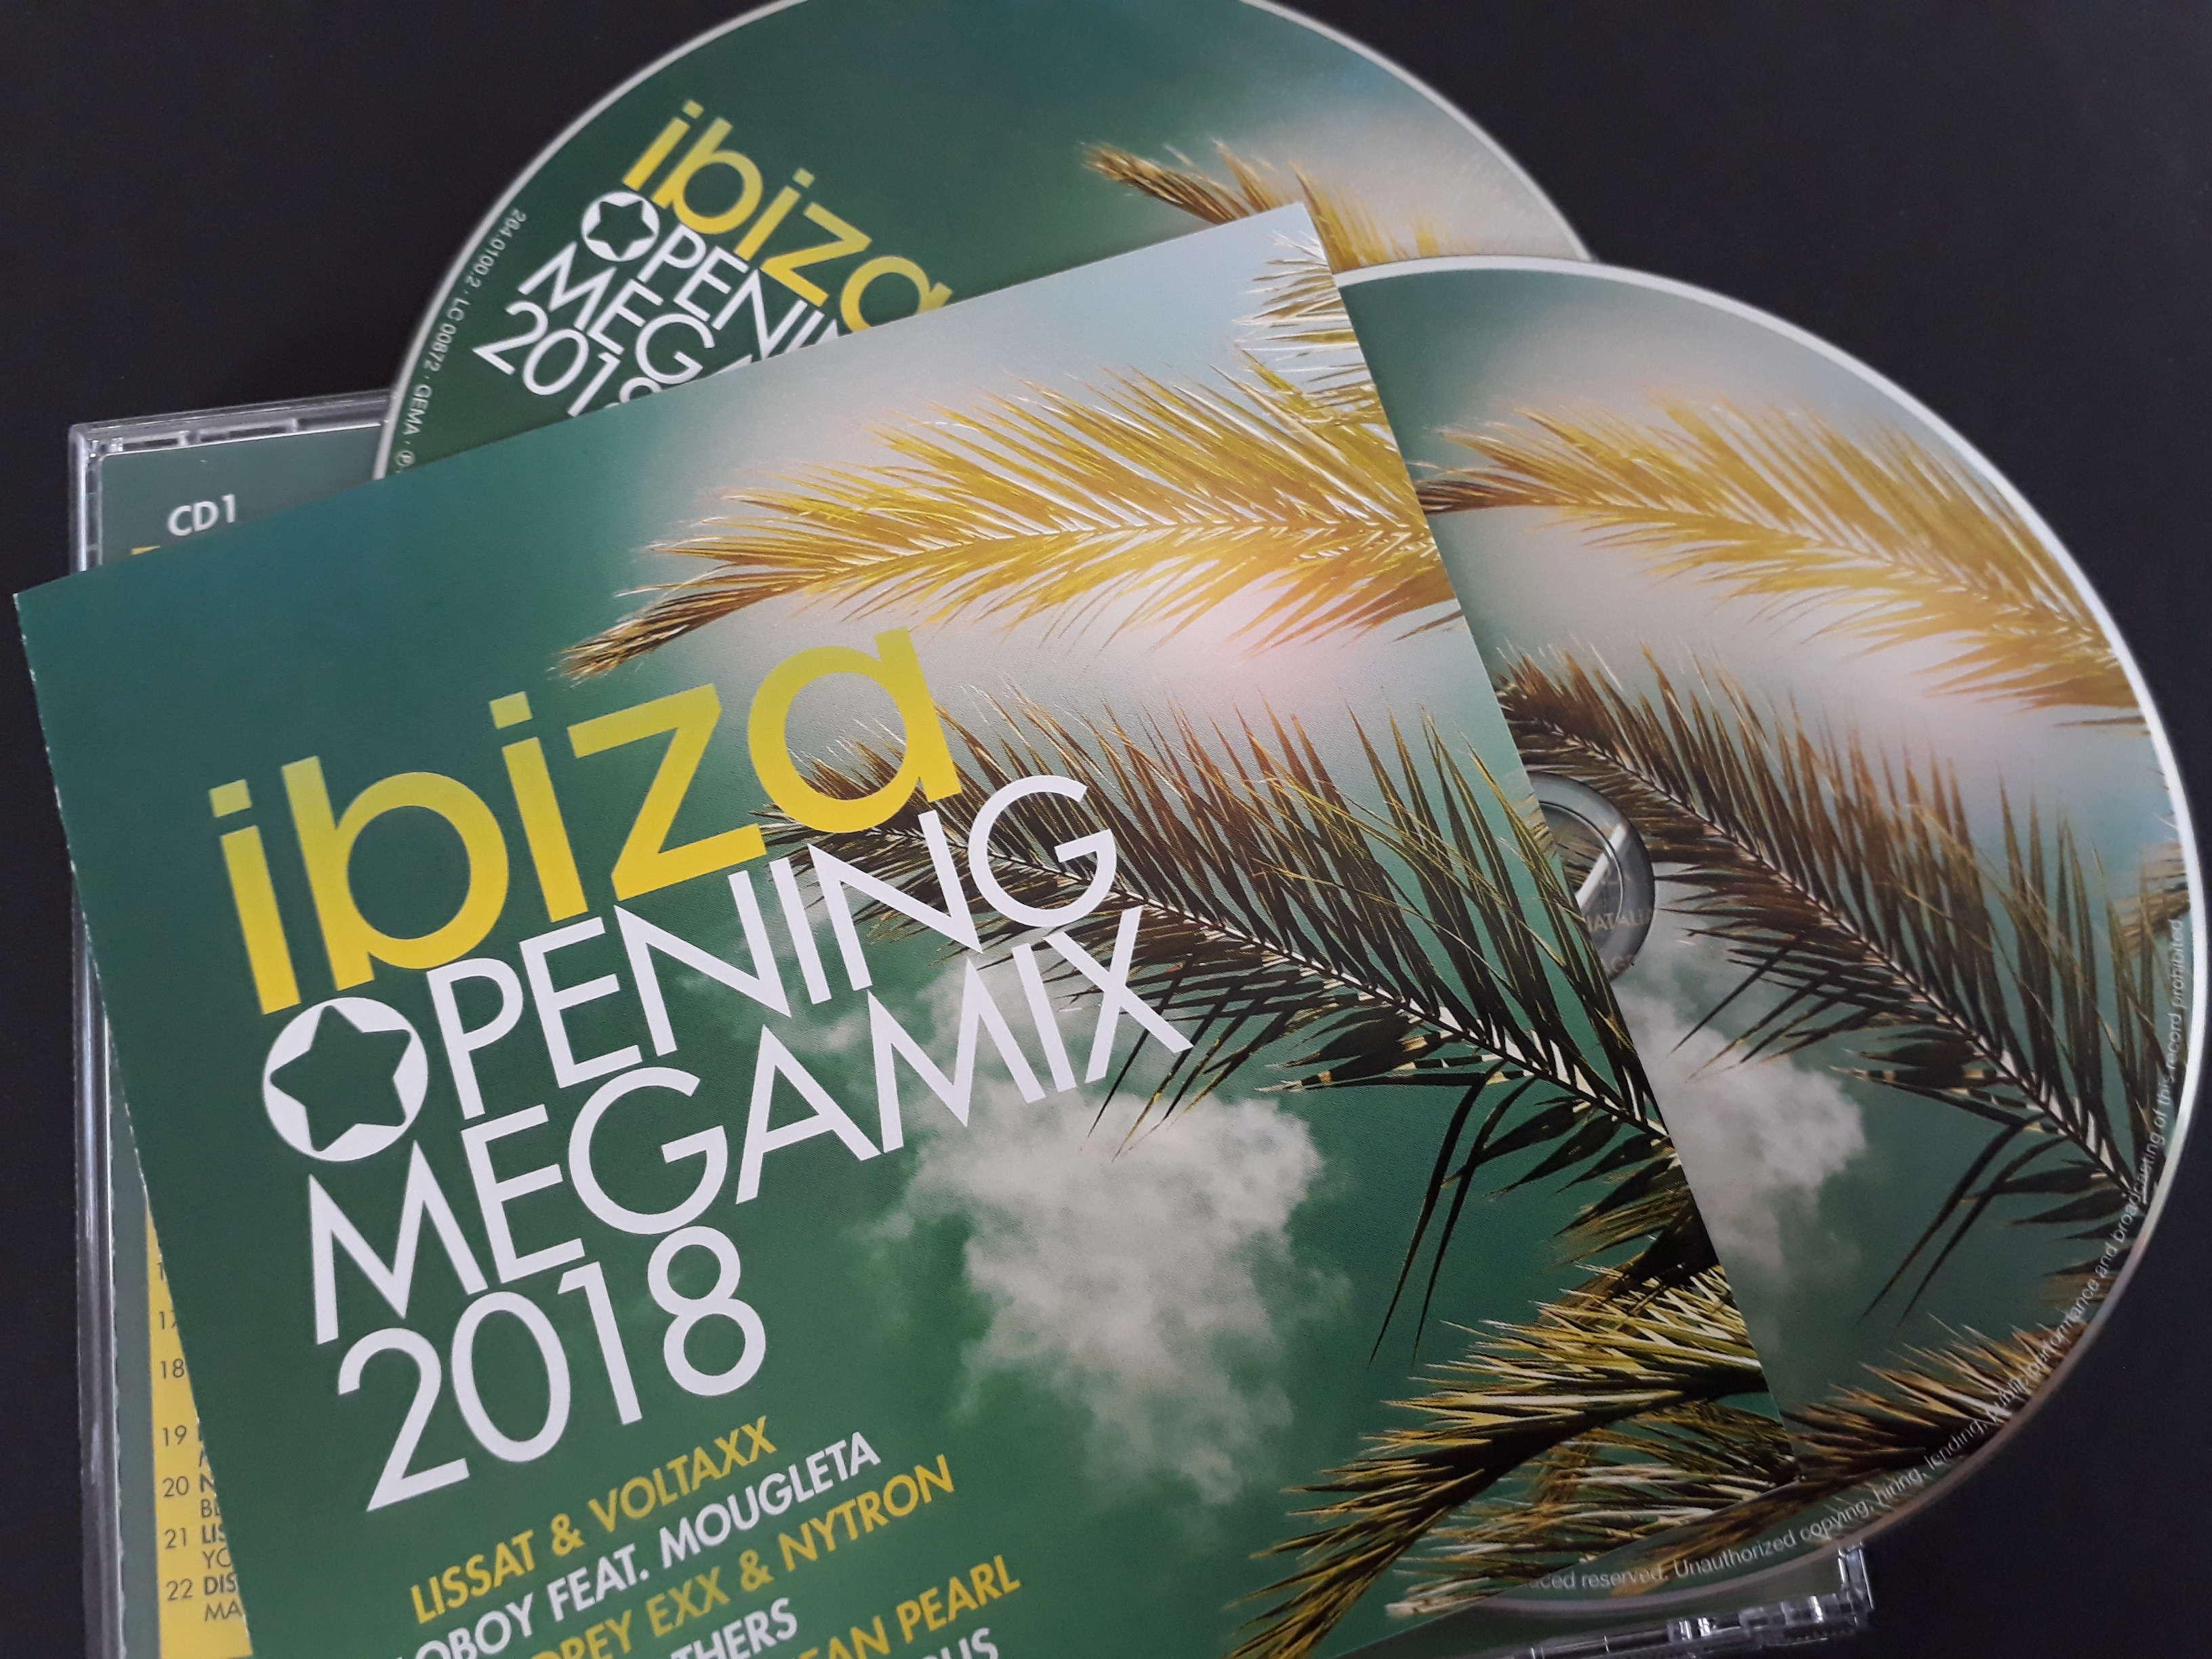 VA-Ibiza Opening Megamix 2018-2CD-2018-VOiCE